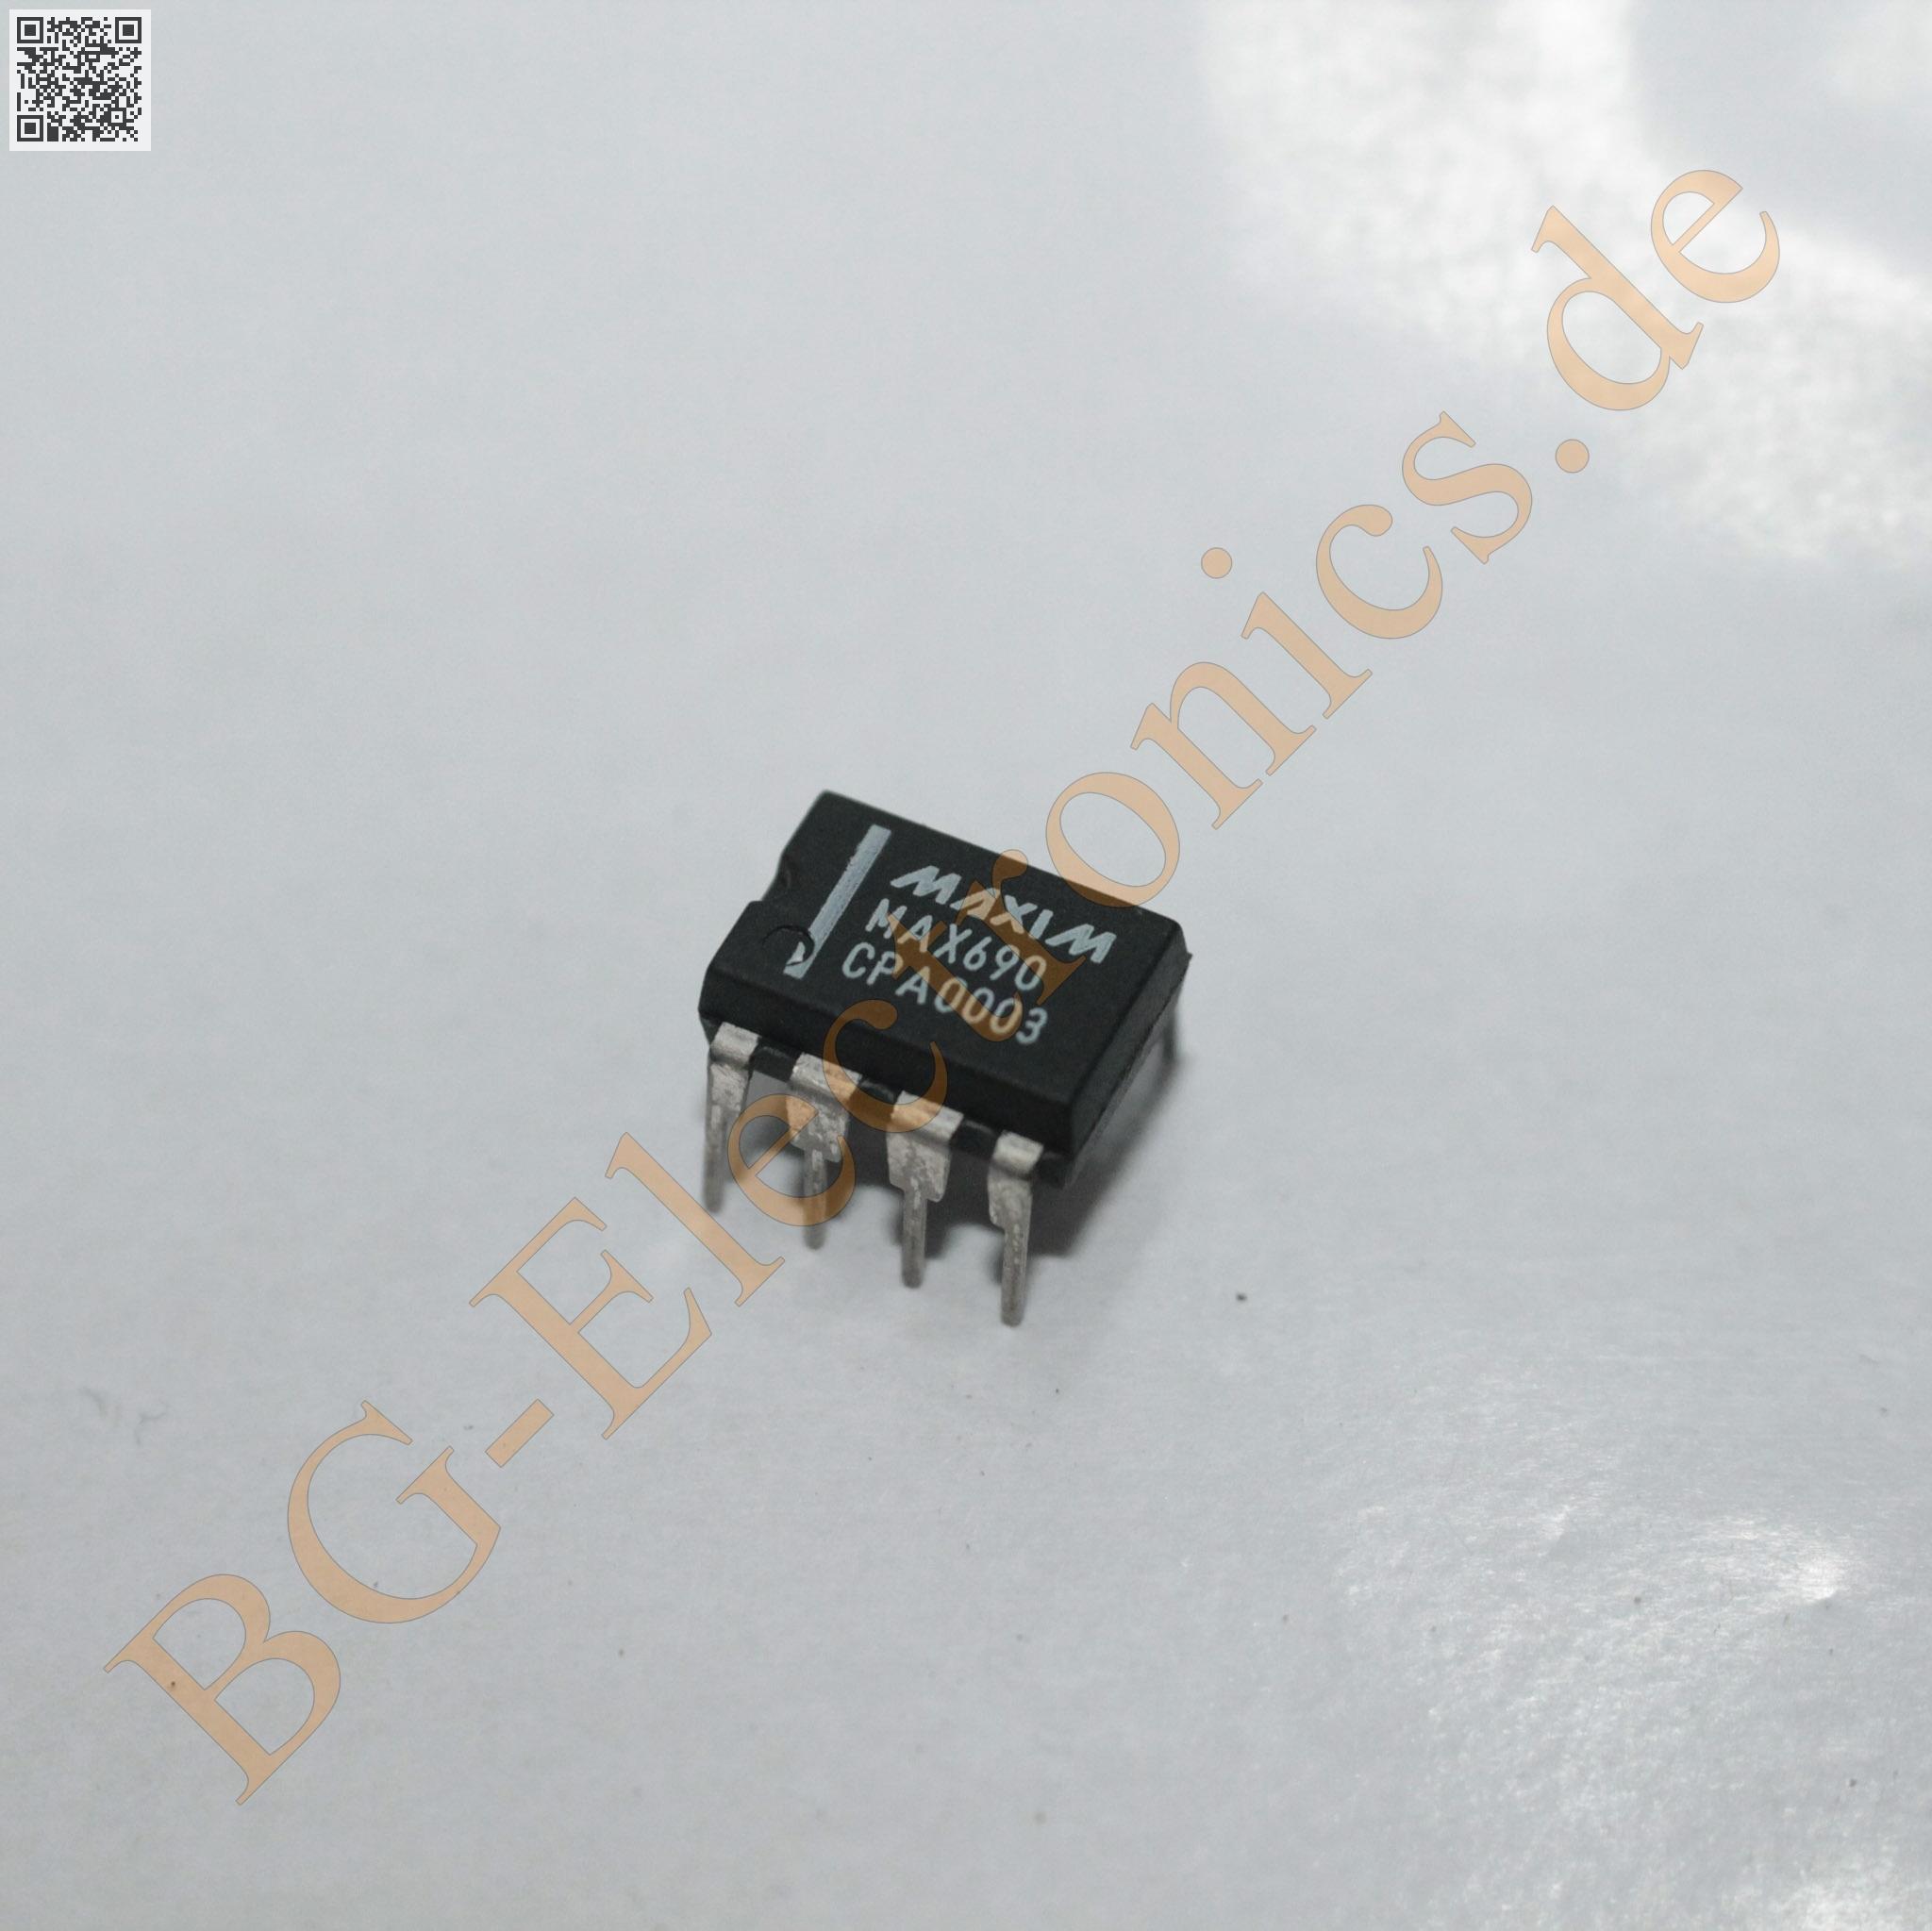 1 x MAX690CPA 3.0V//3.3V Microprocessor Supervisory Circuits Maxim DIP-8 1pcs